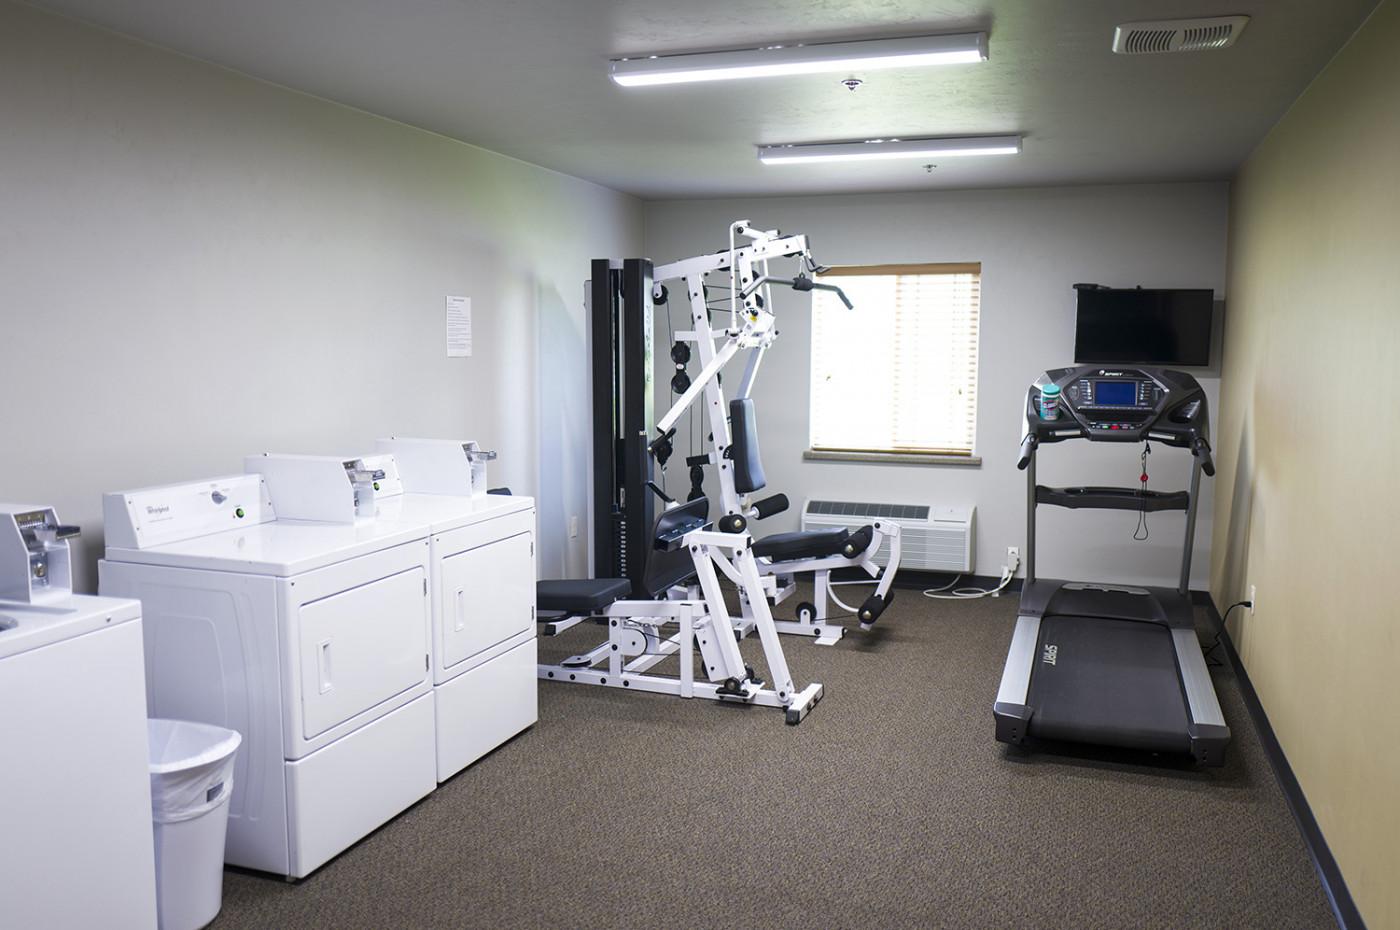 Kings_UW-FoxValley_FoxVillage_laundry_fitnessroom_1500.jpg